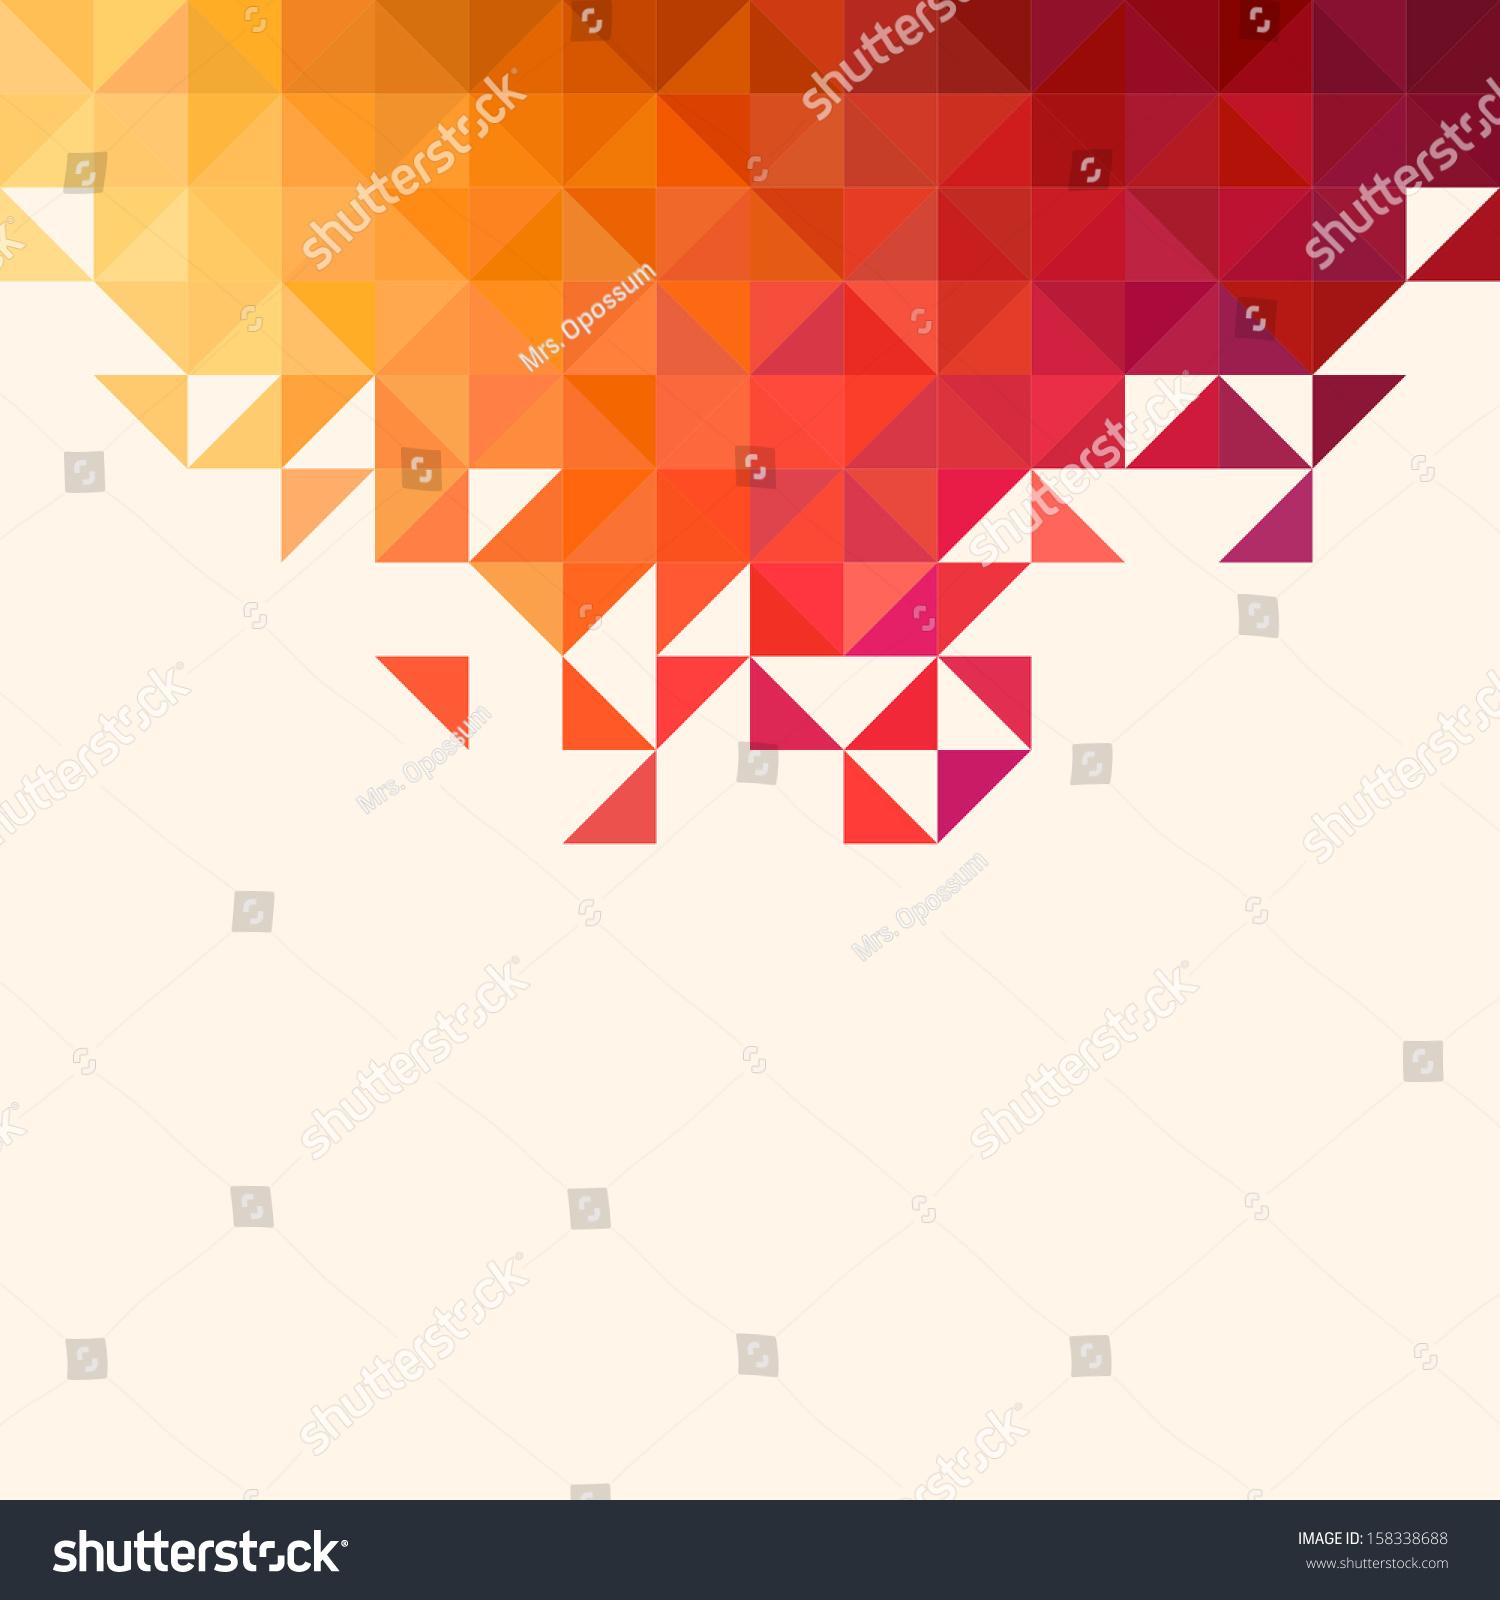 Background Geometric Shapes Colorful Mosaic Pattern Stock